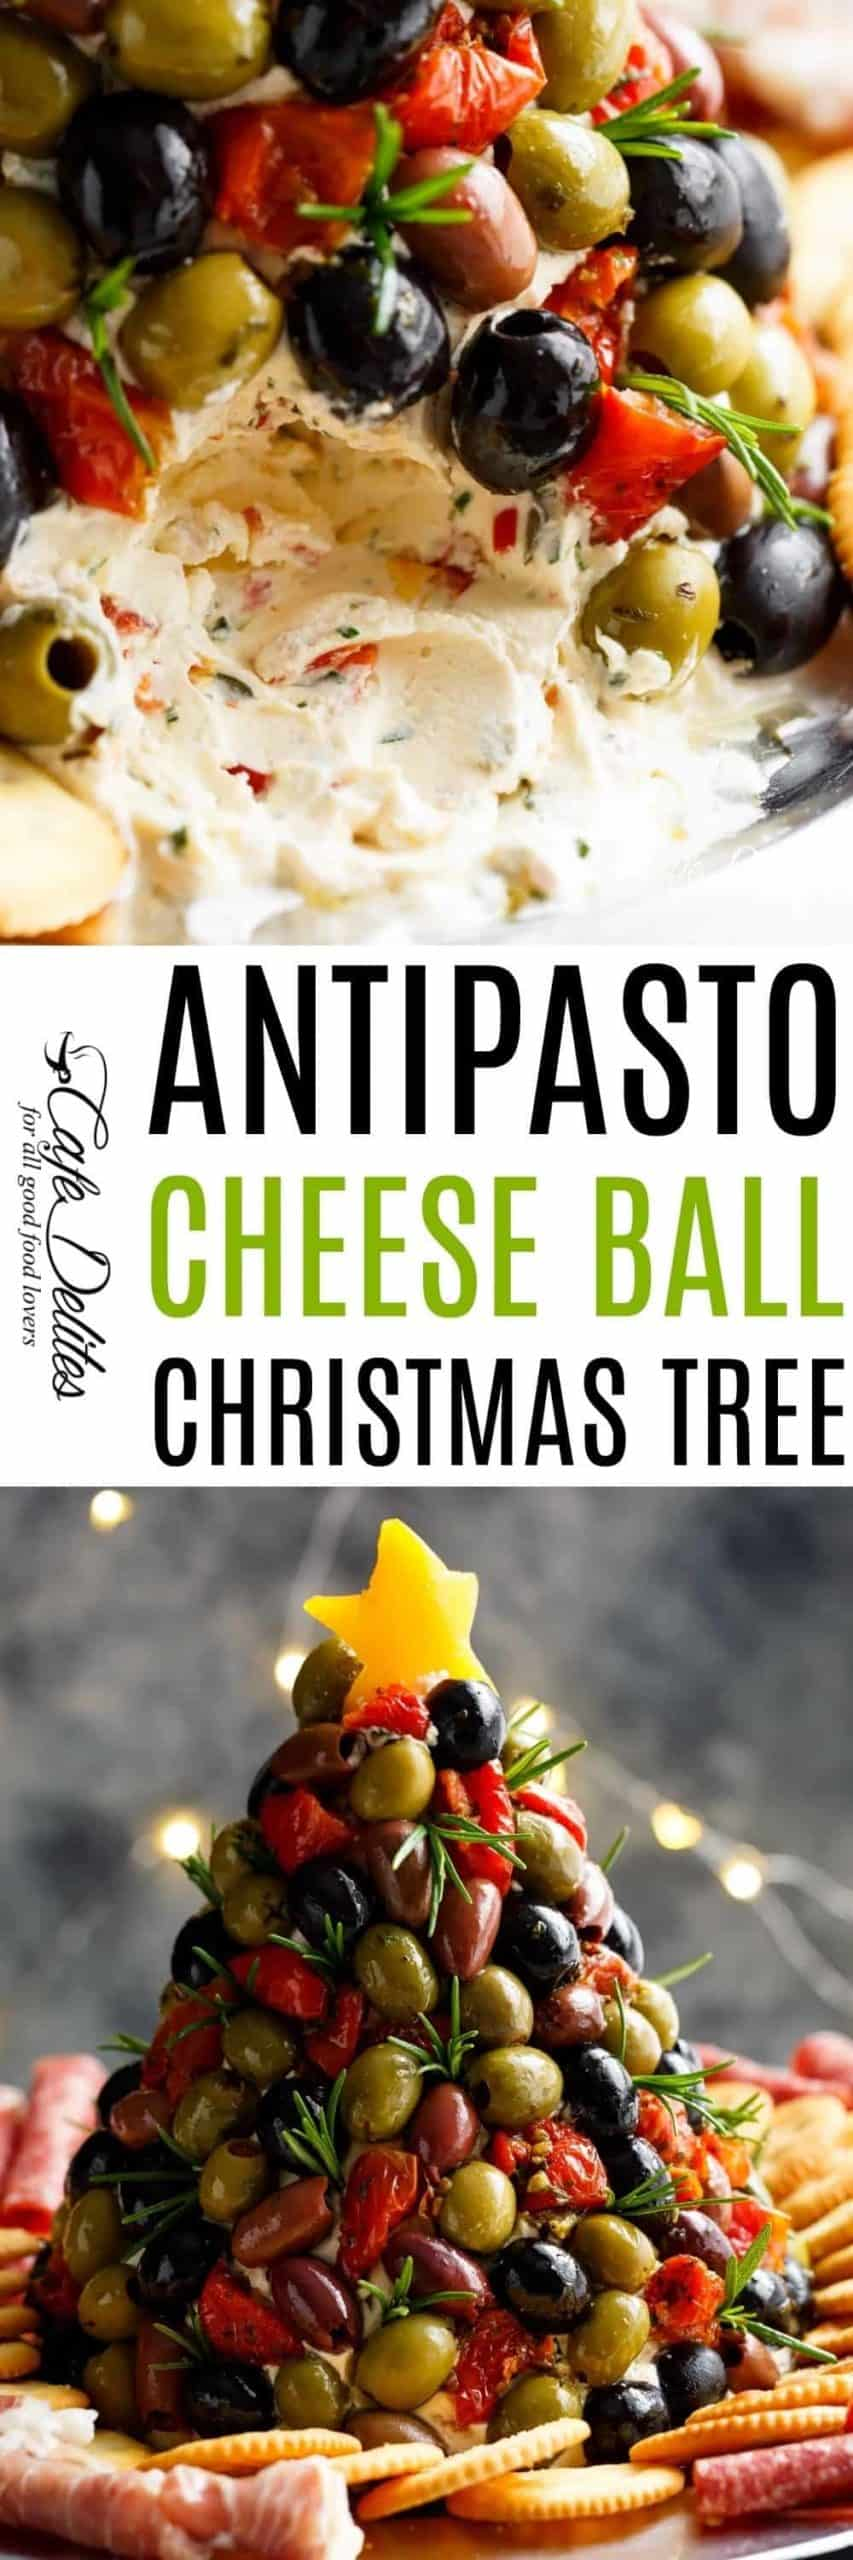 Antipasto Cheese Ball Christmas Tree | cafedelites.com